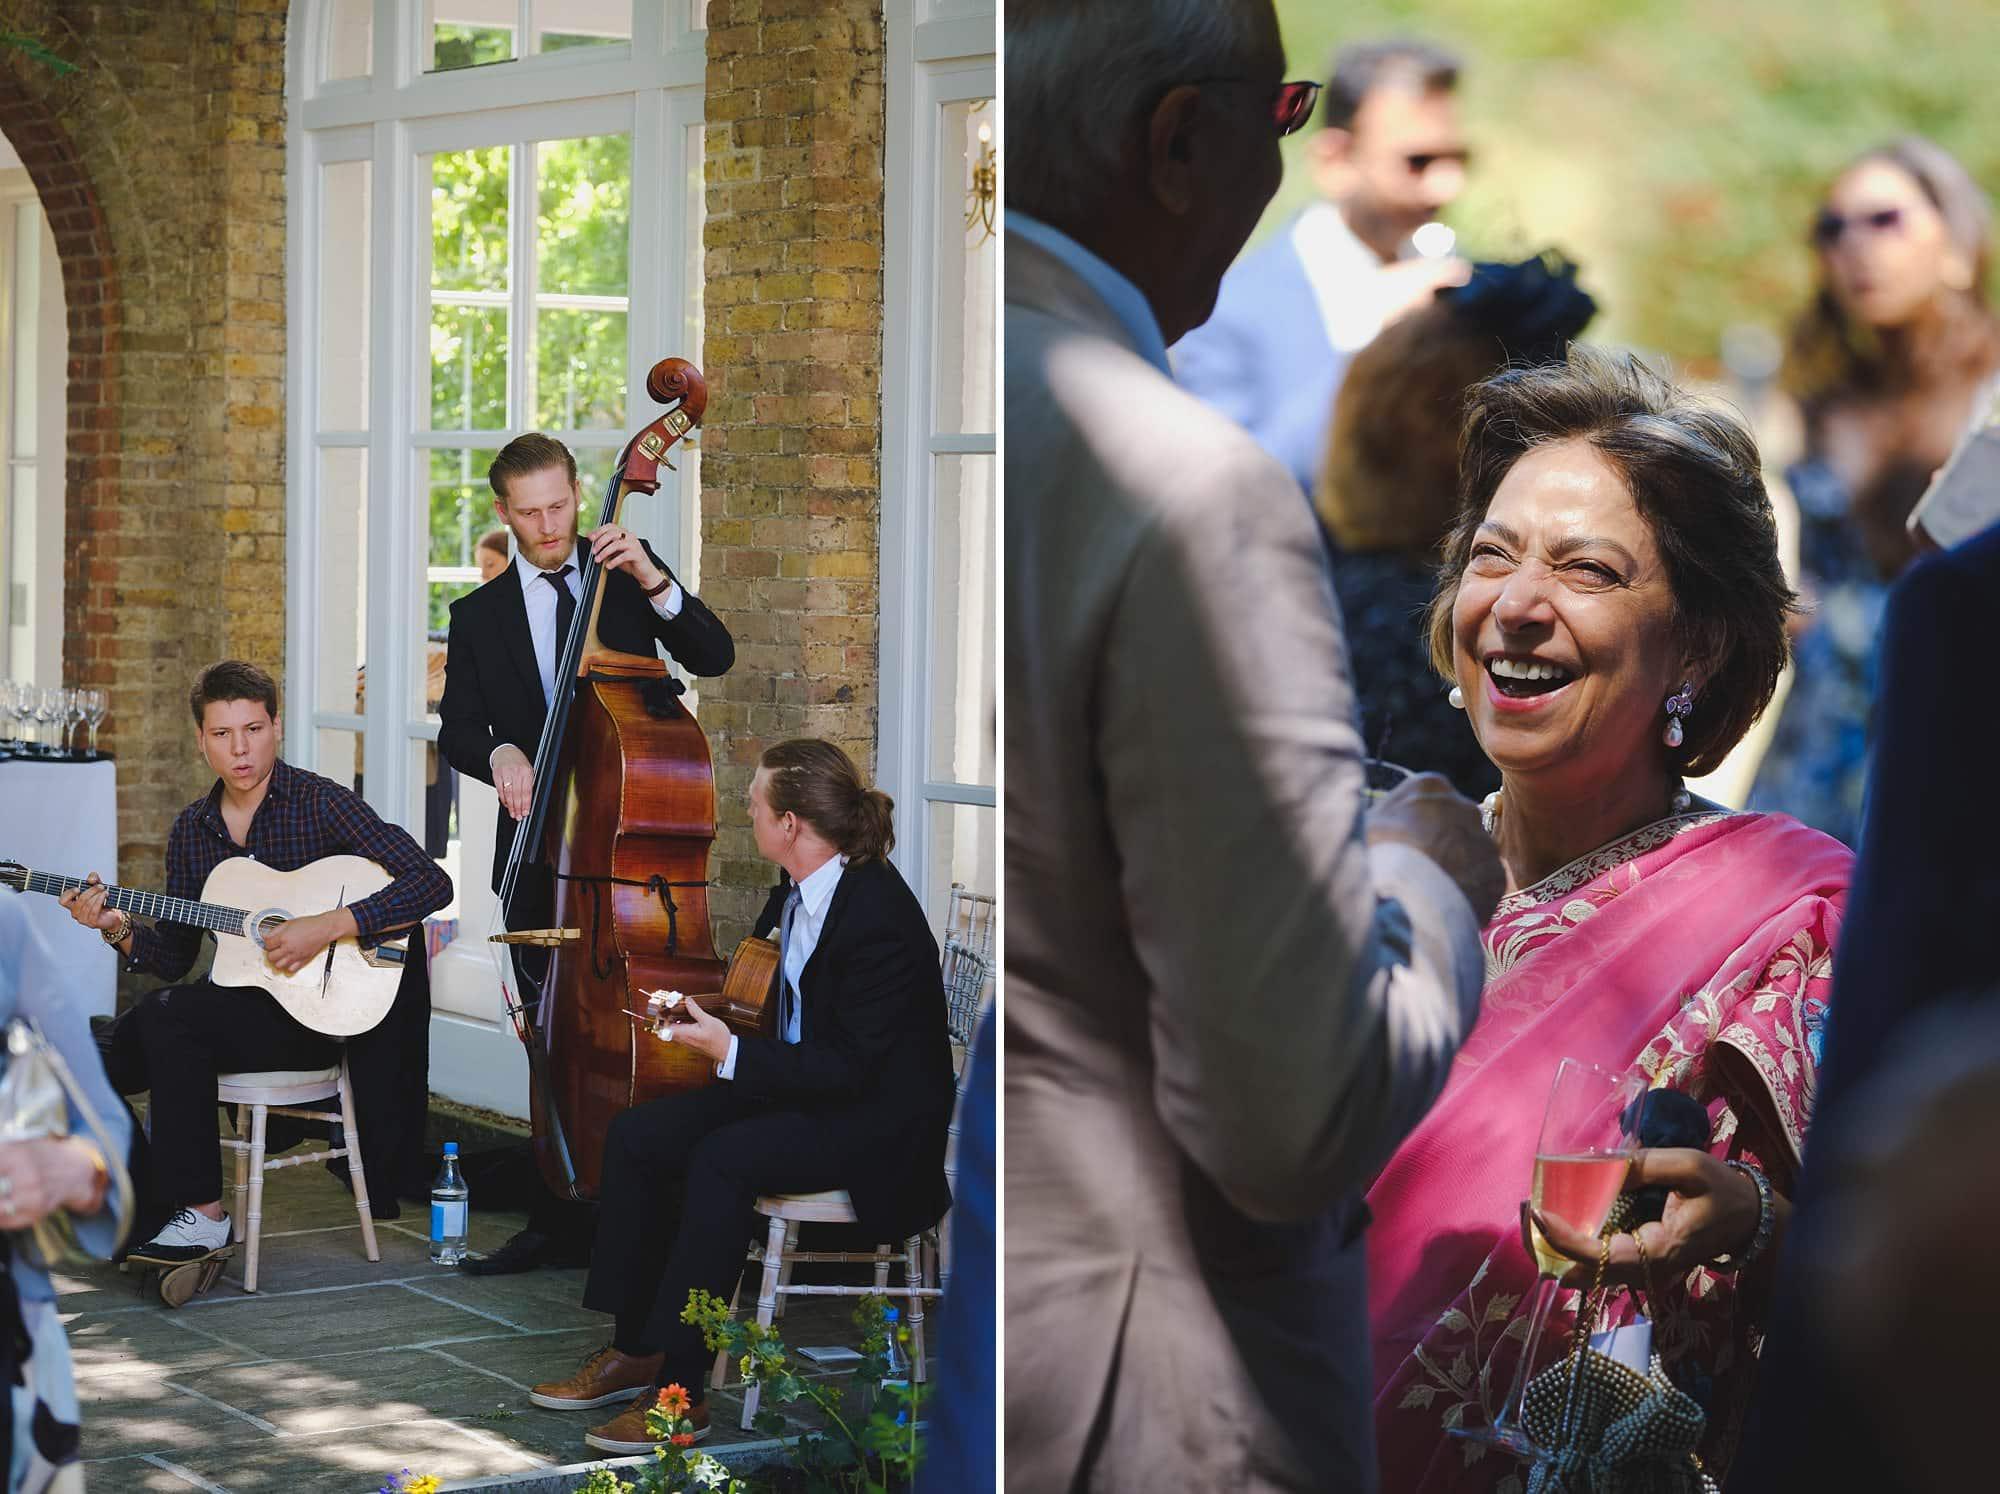 orangery holland park wedding reception 016 - Holland Park Orangery Wedding Photographer | Ayesha & Ritam